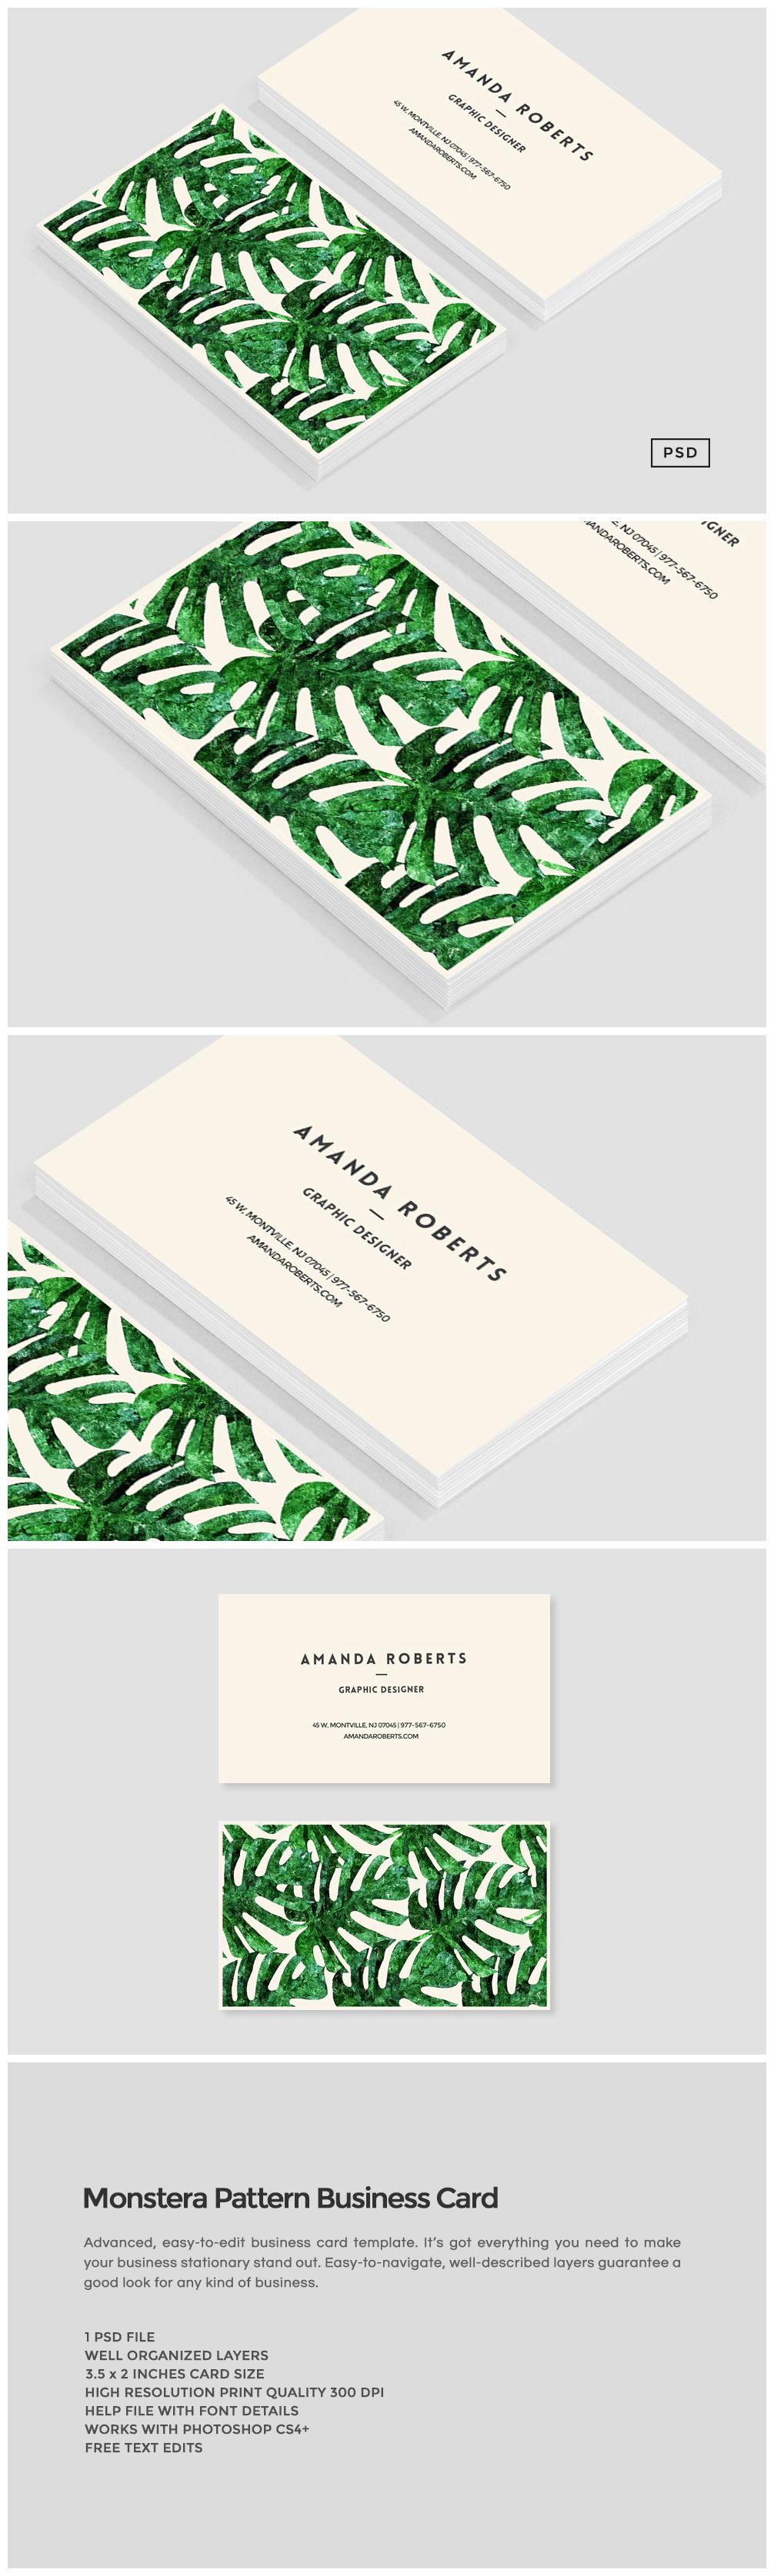 Monstera Pattern Business Card Business Card Pattern Business Cards Creative Templates Business Card Design